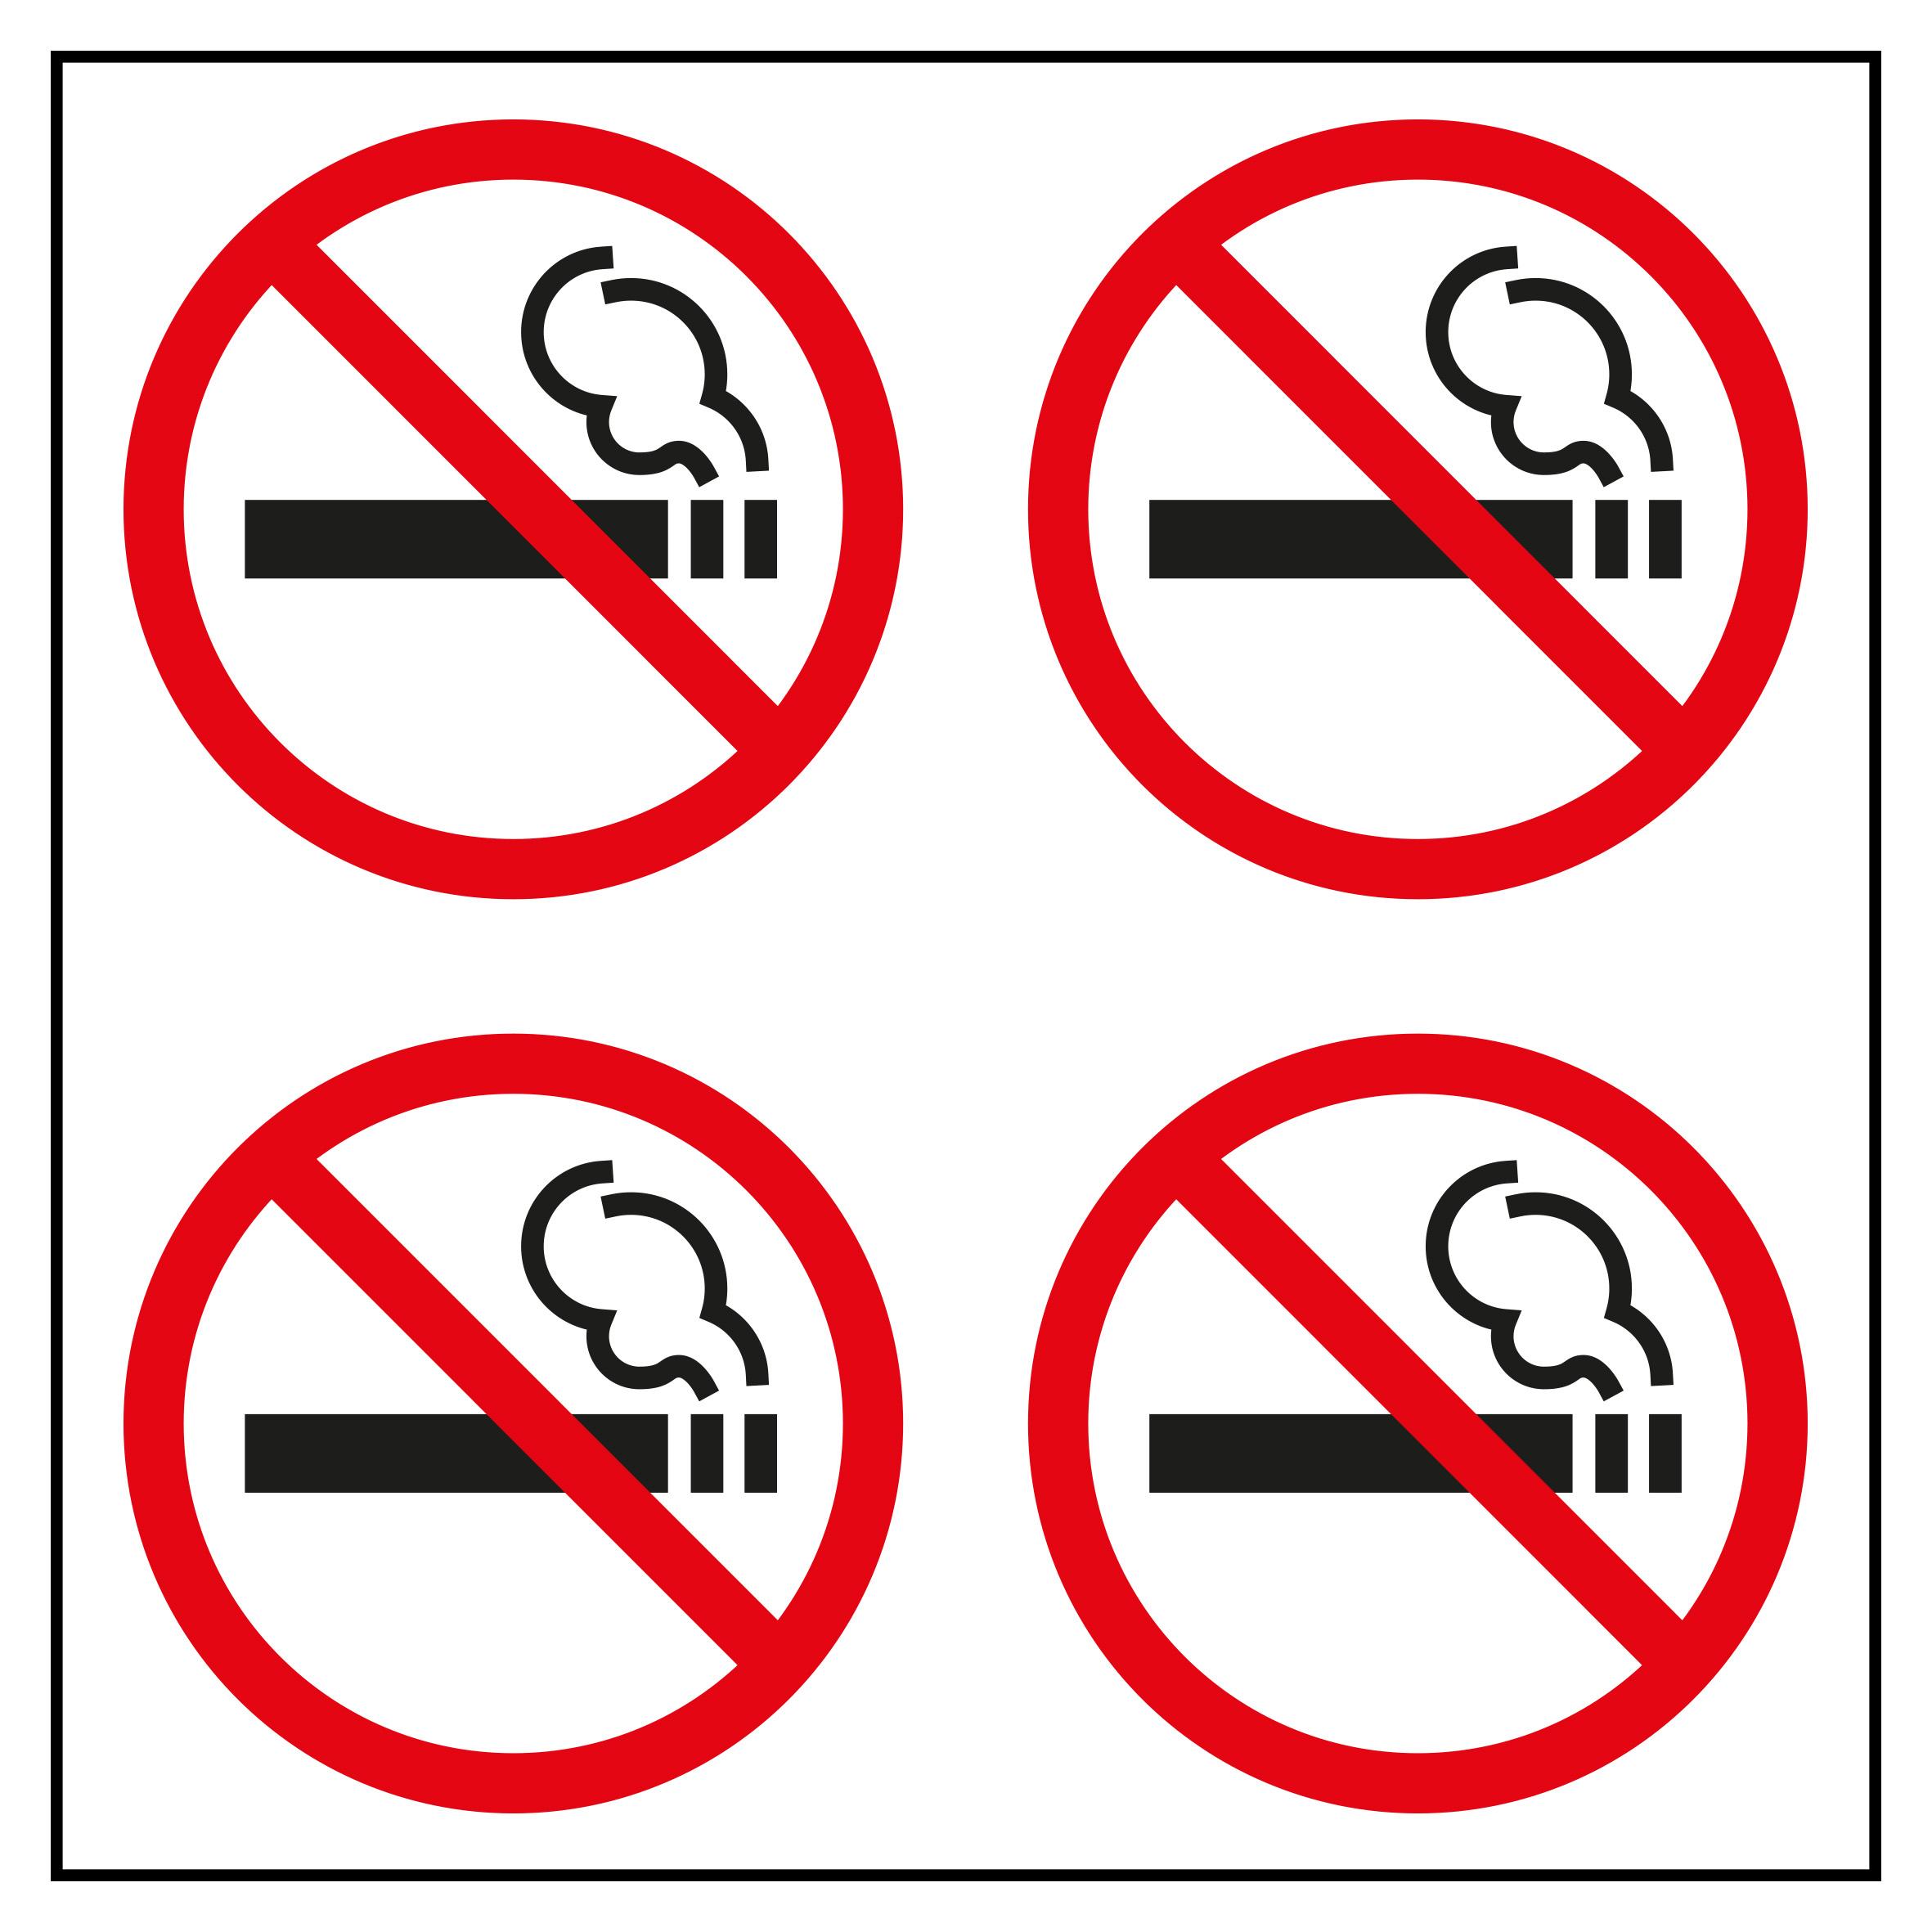 Apli 12139 Bolsa Etiquetas Prohibido Fumar Peque/ño